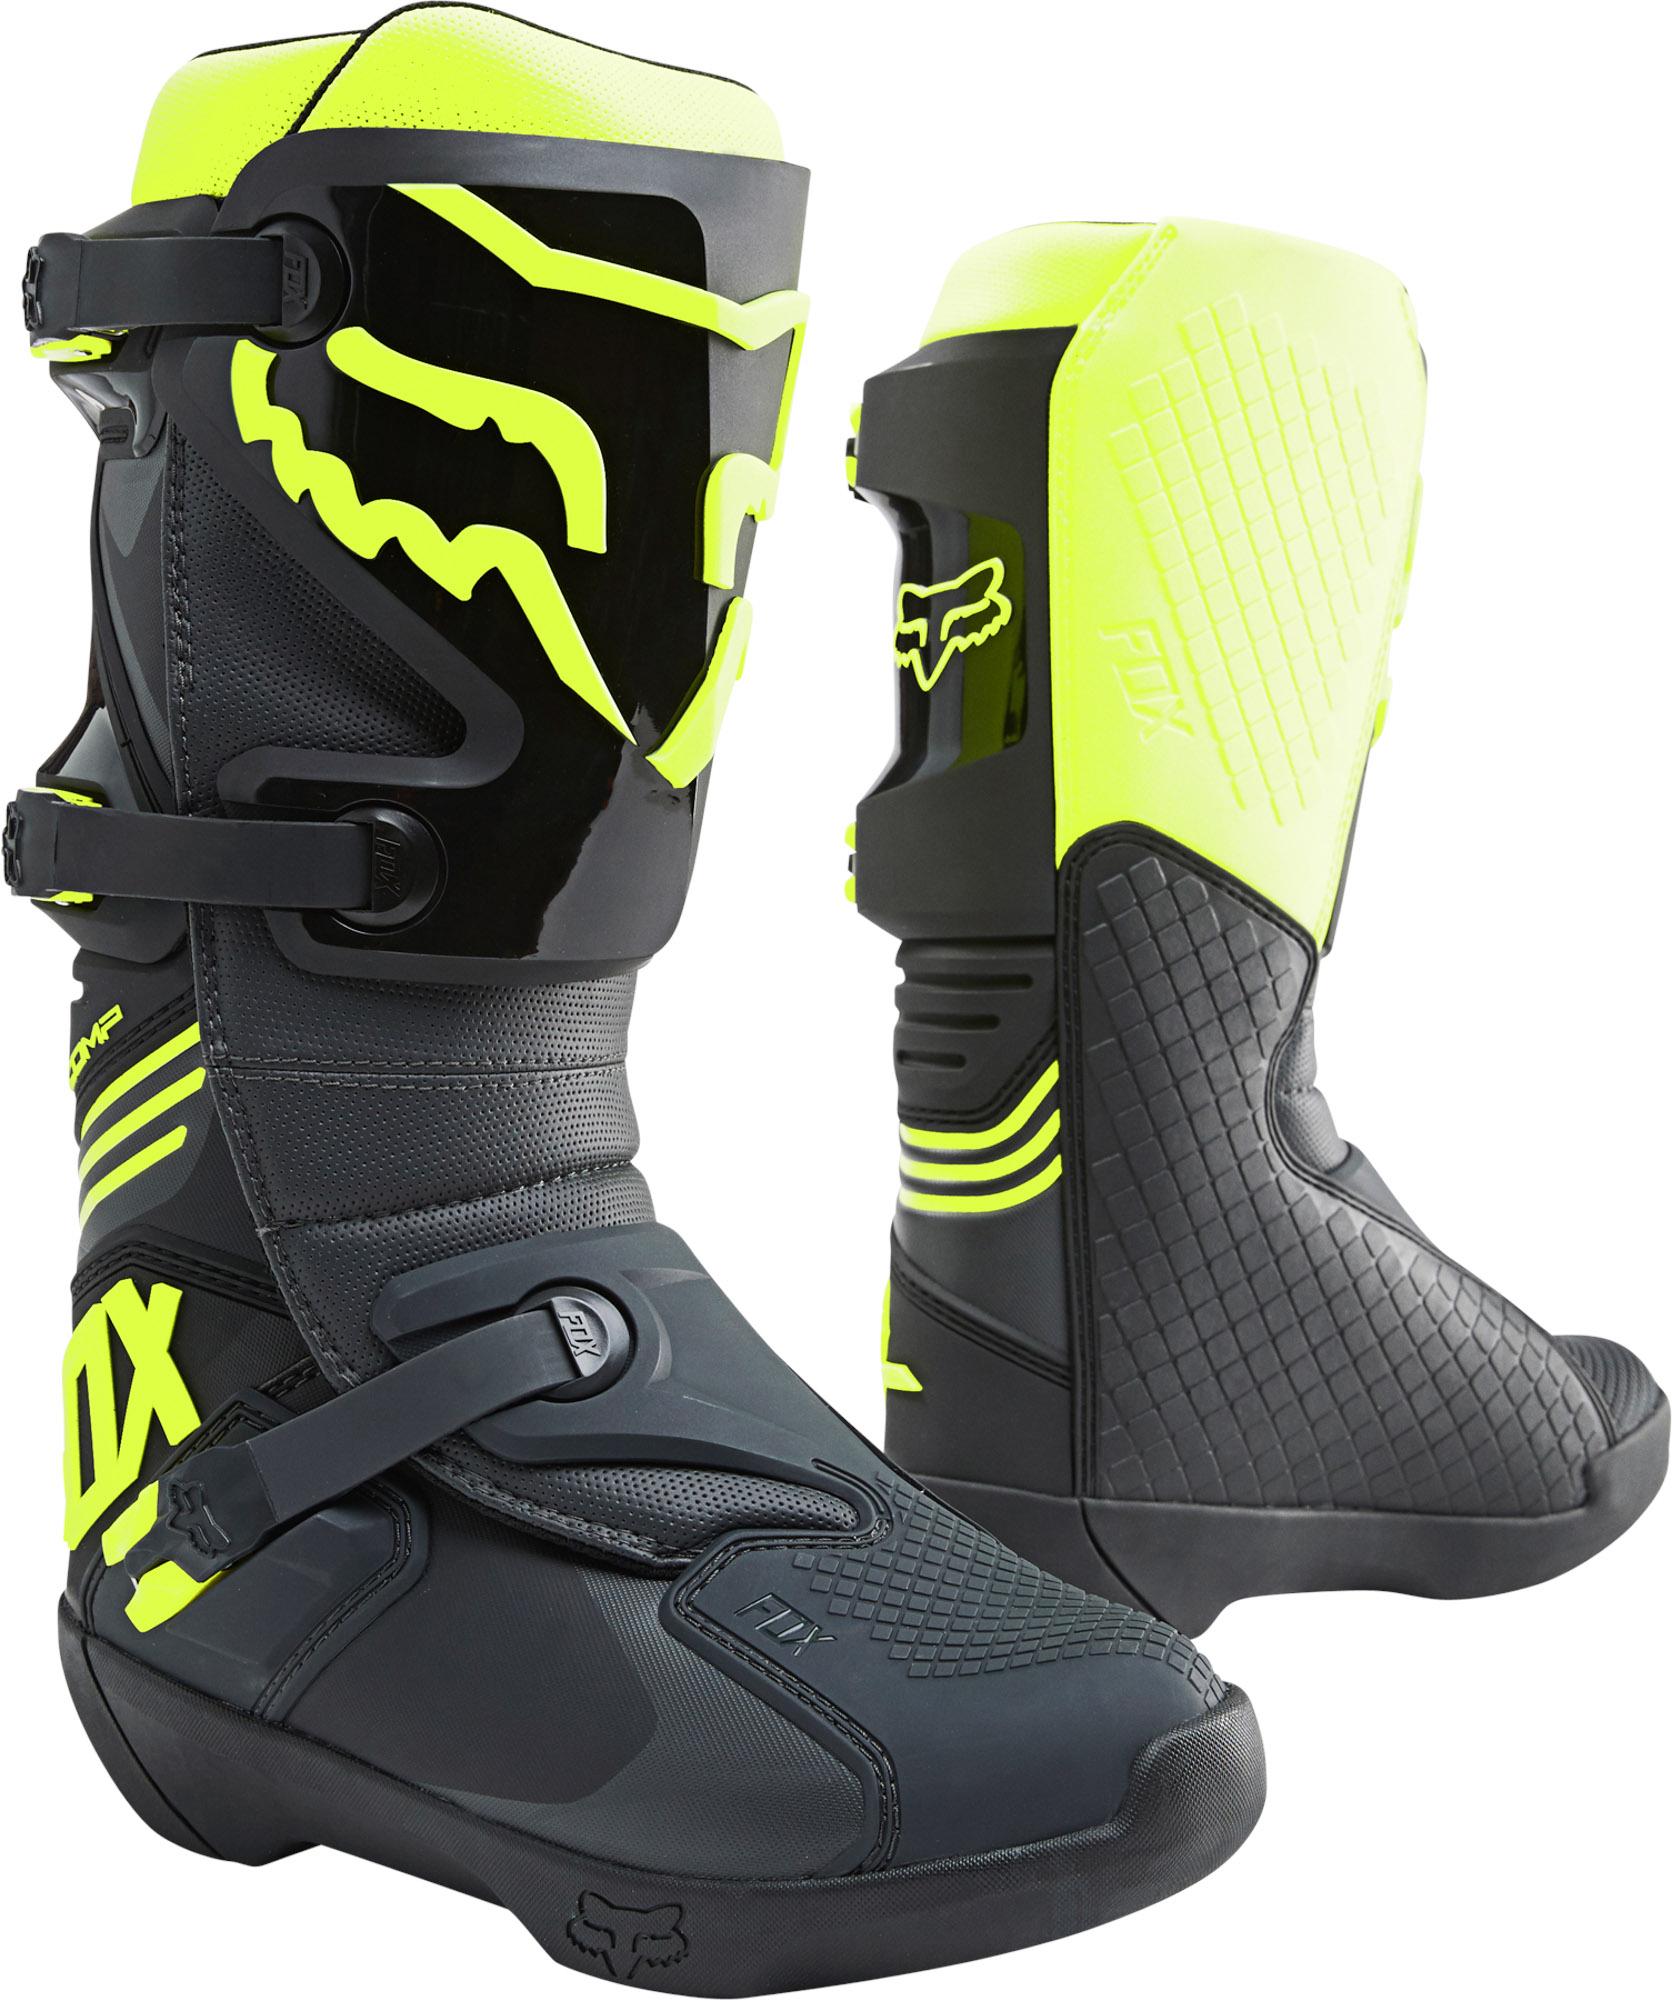 FOX Comp Boot - BLACK/YELLOW MX22